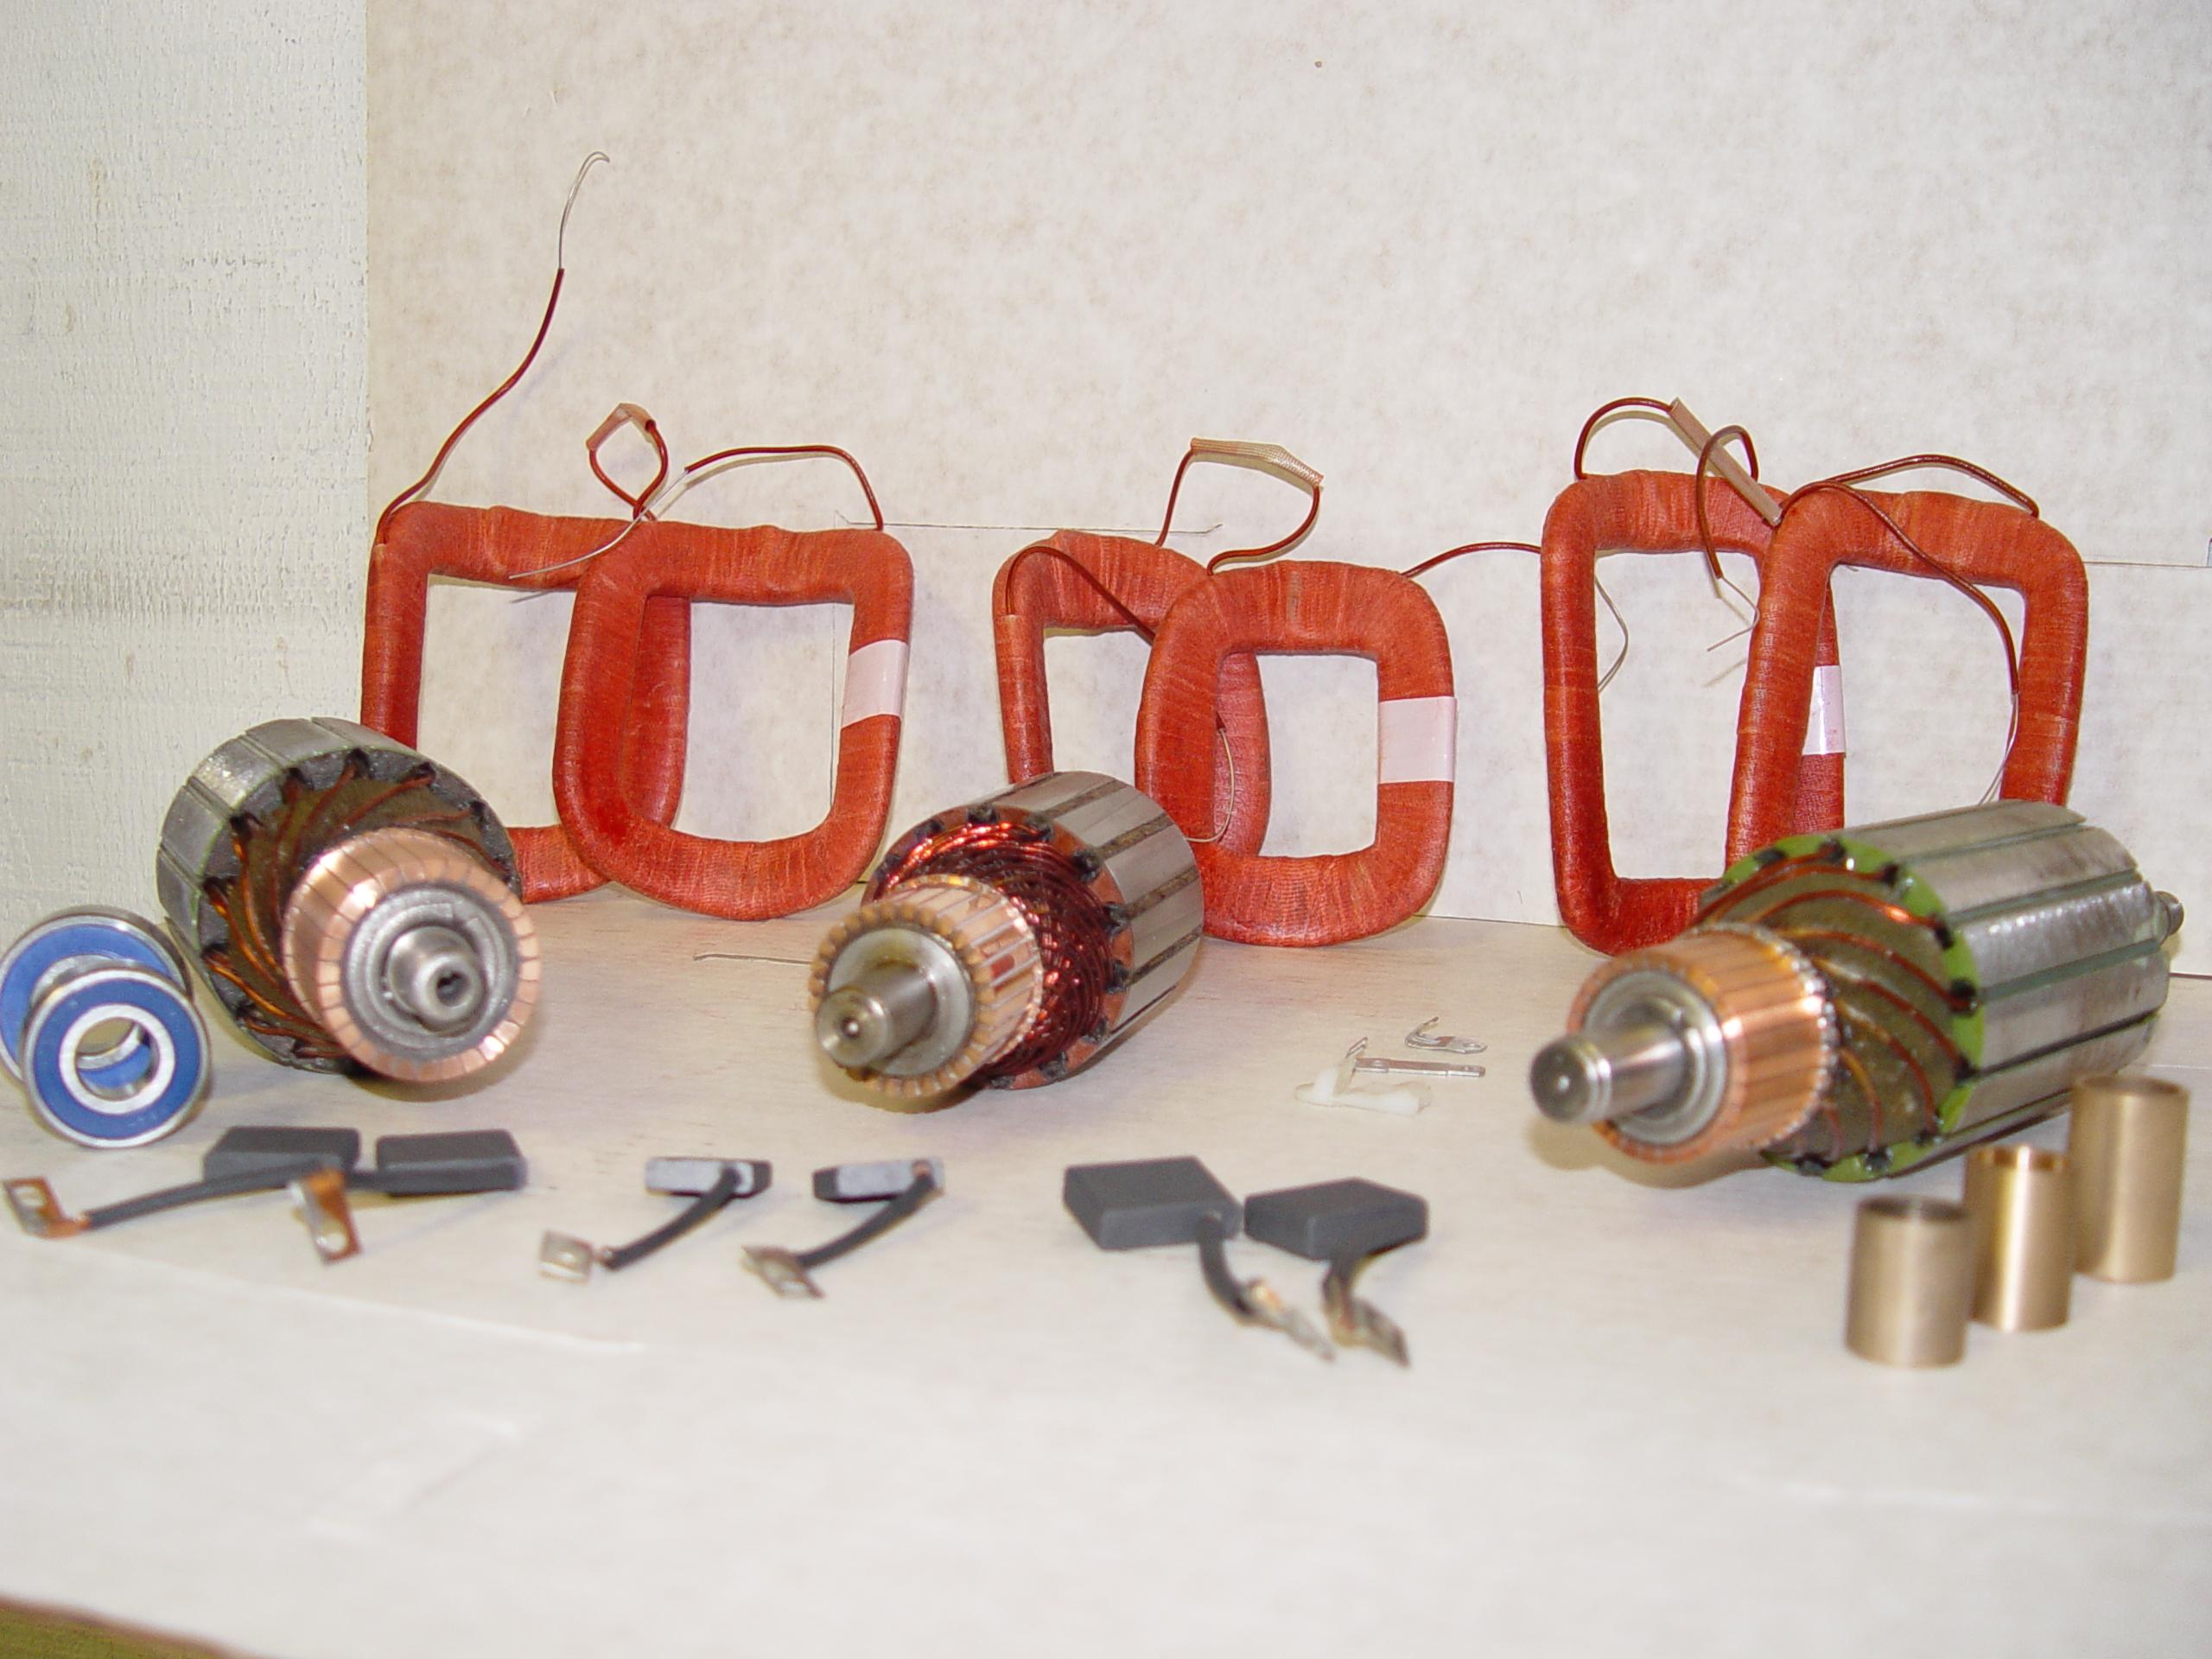 New Generator Components